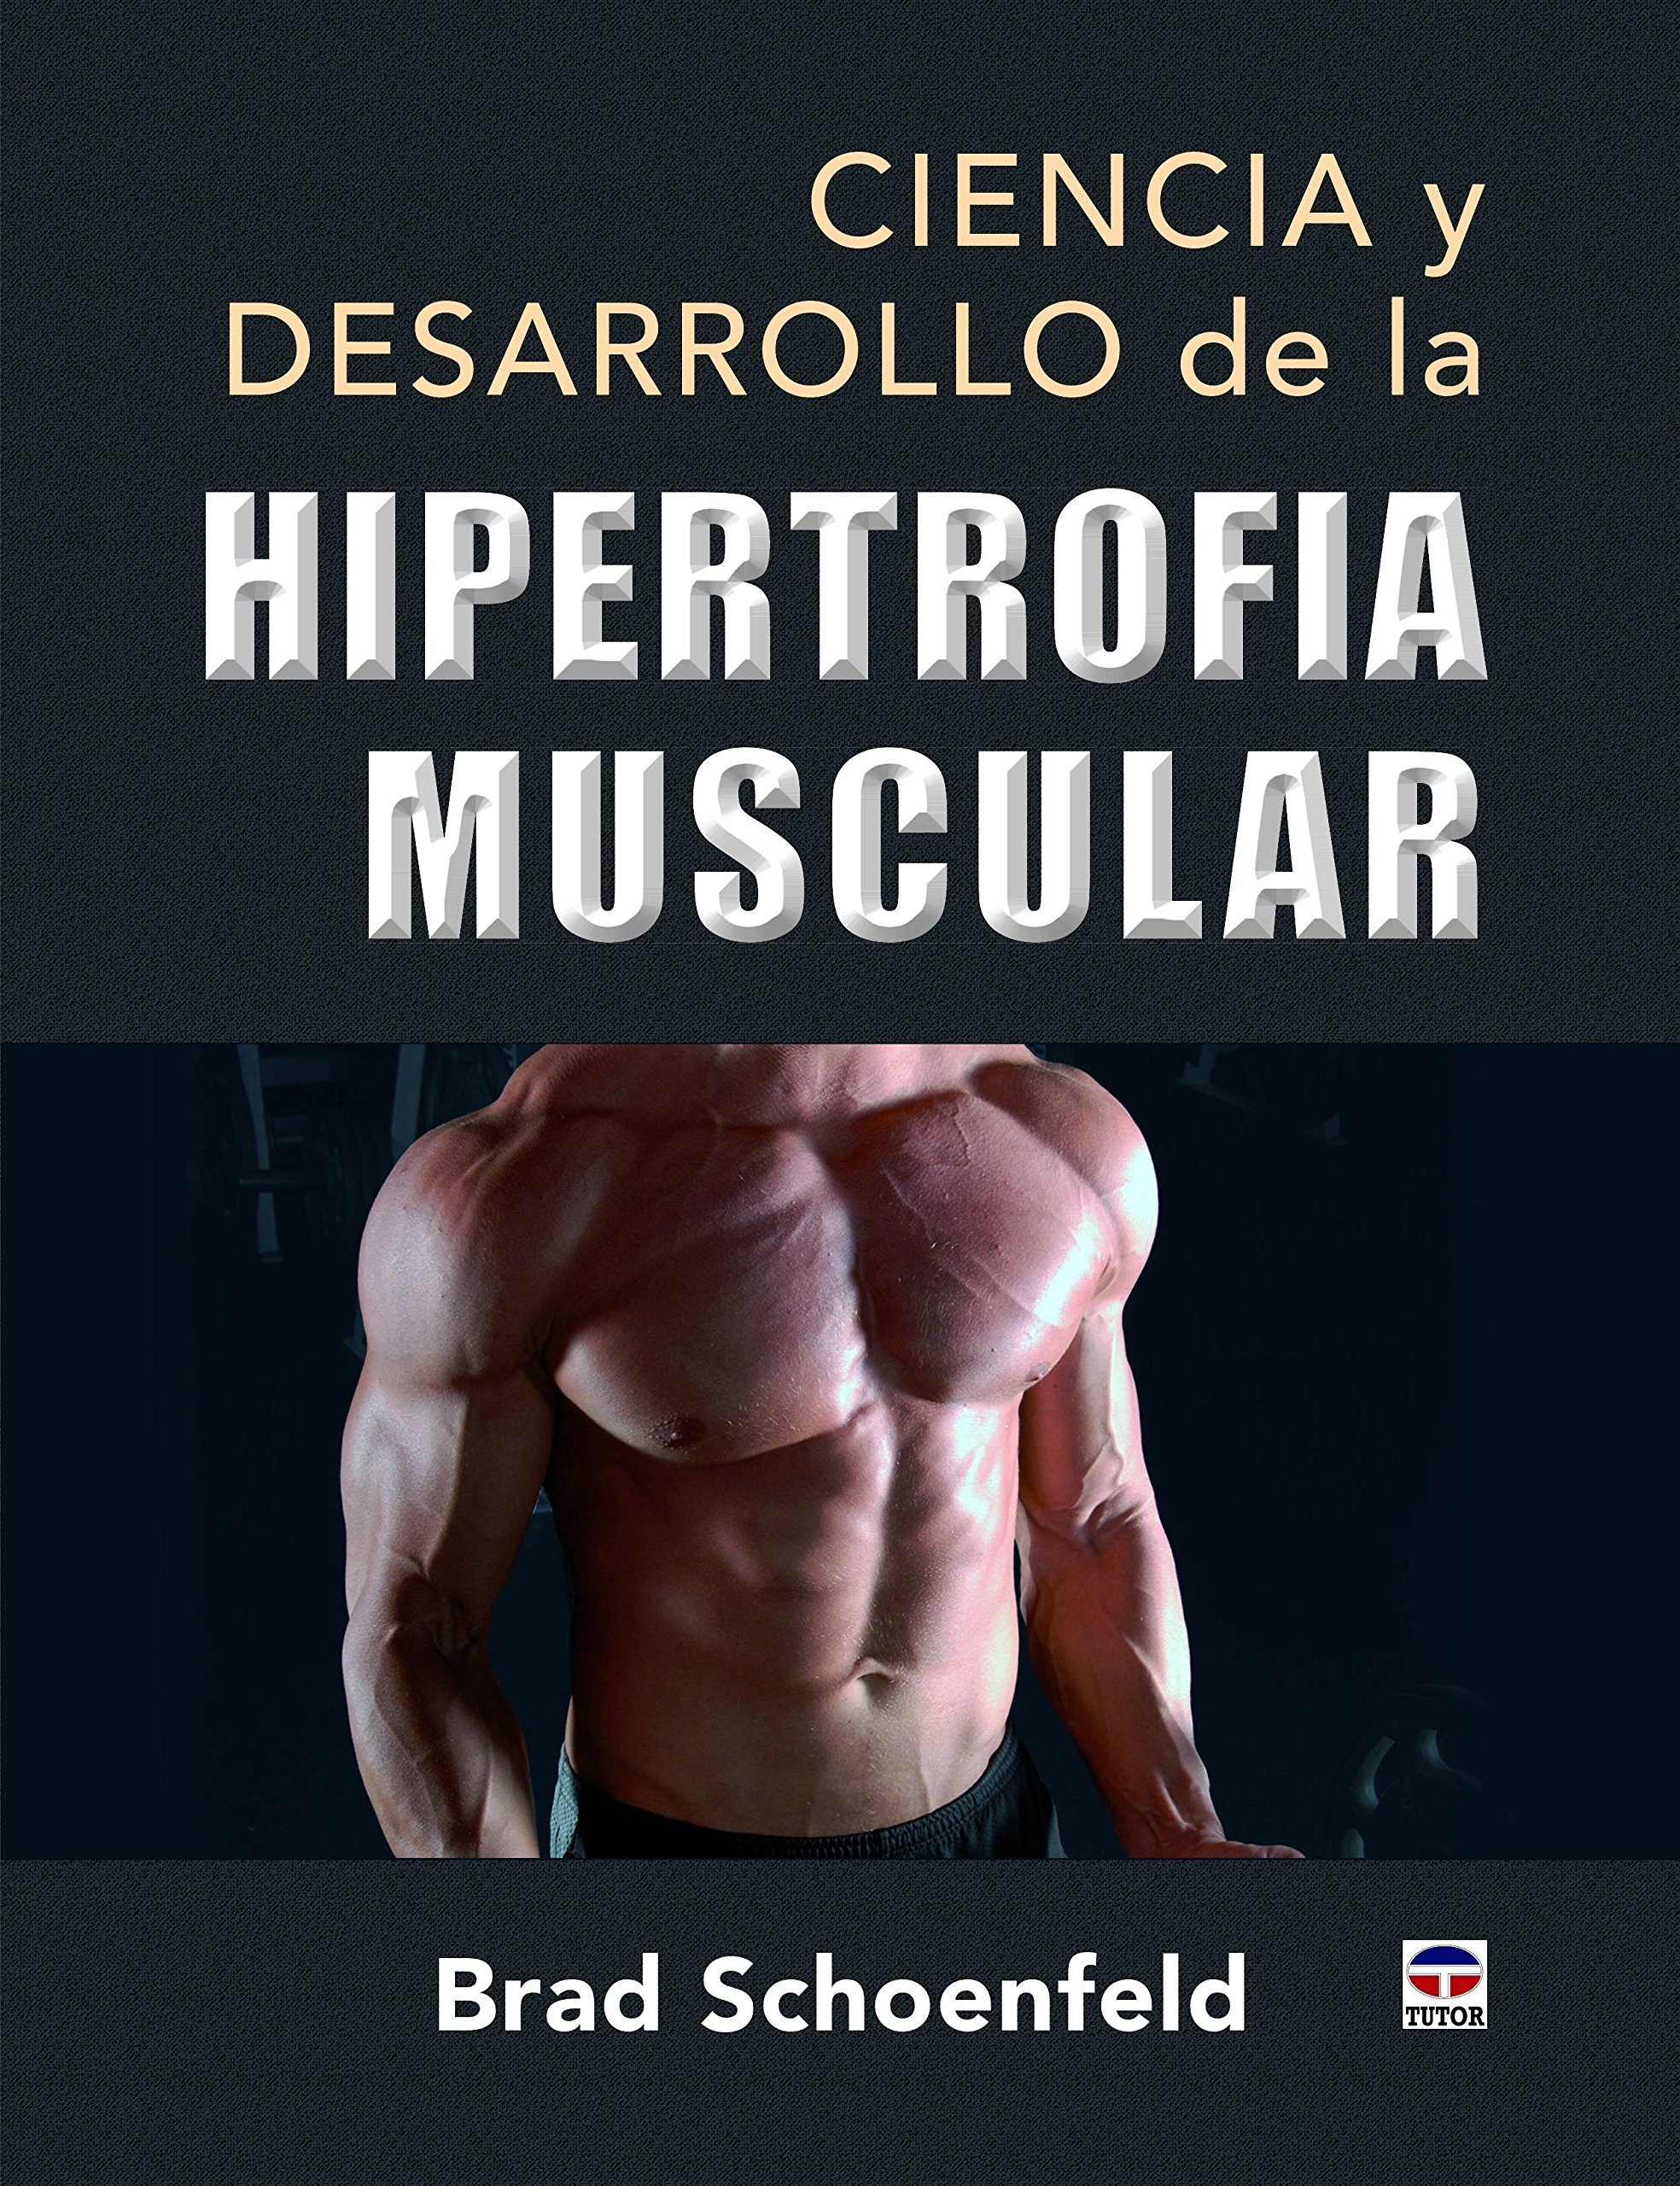 Dieta online gratis hipertrofia